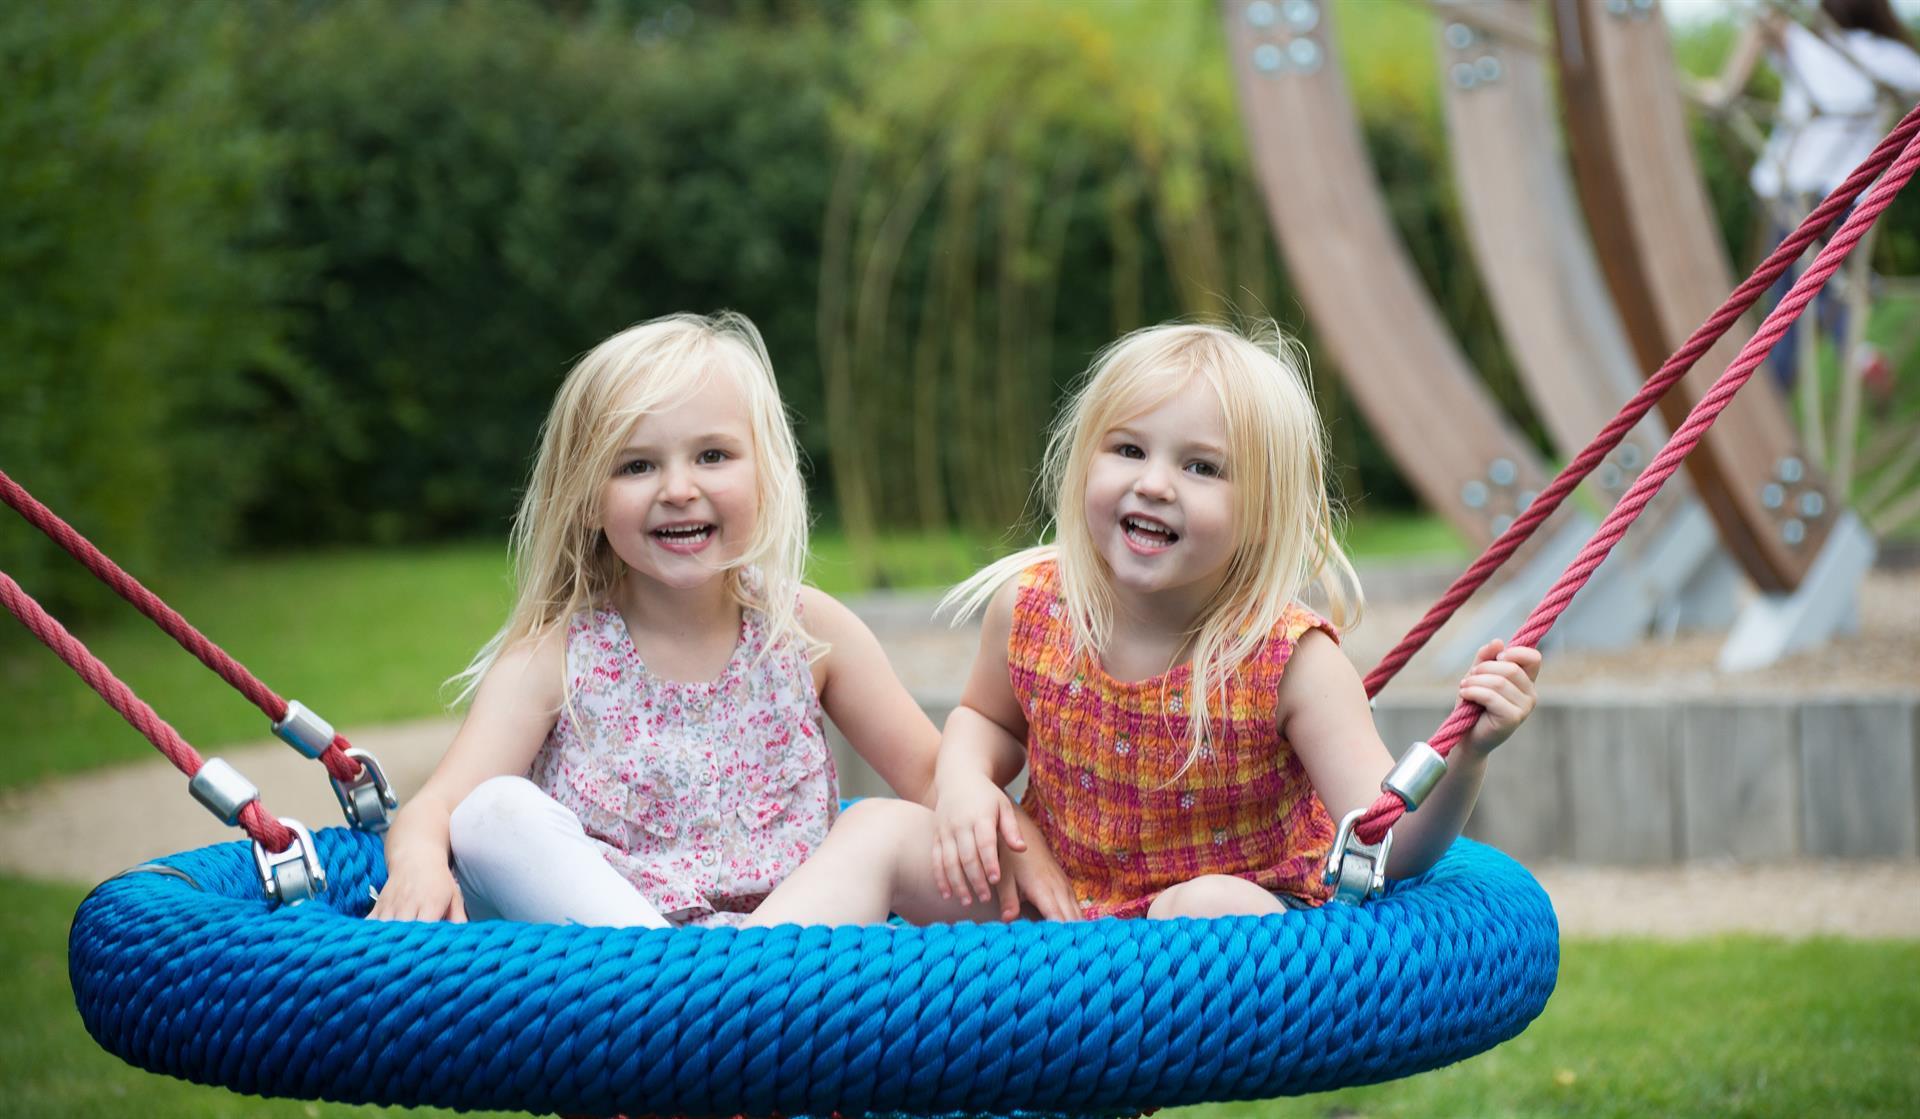 Children in Sensory Play Garden